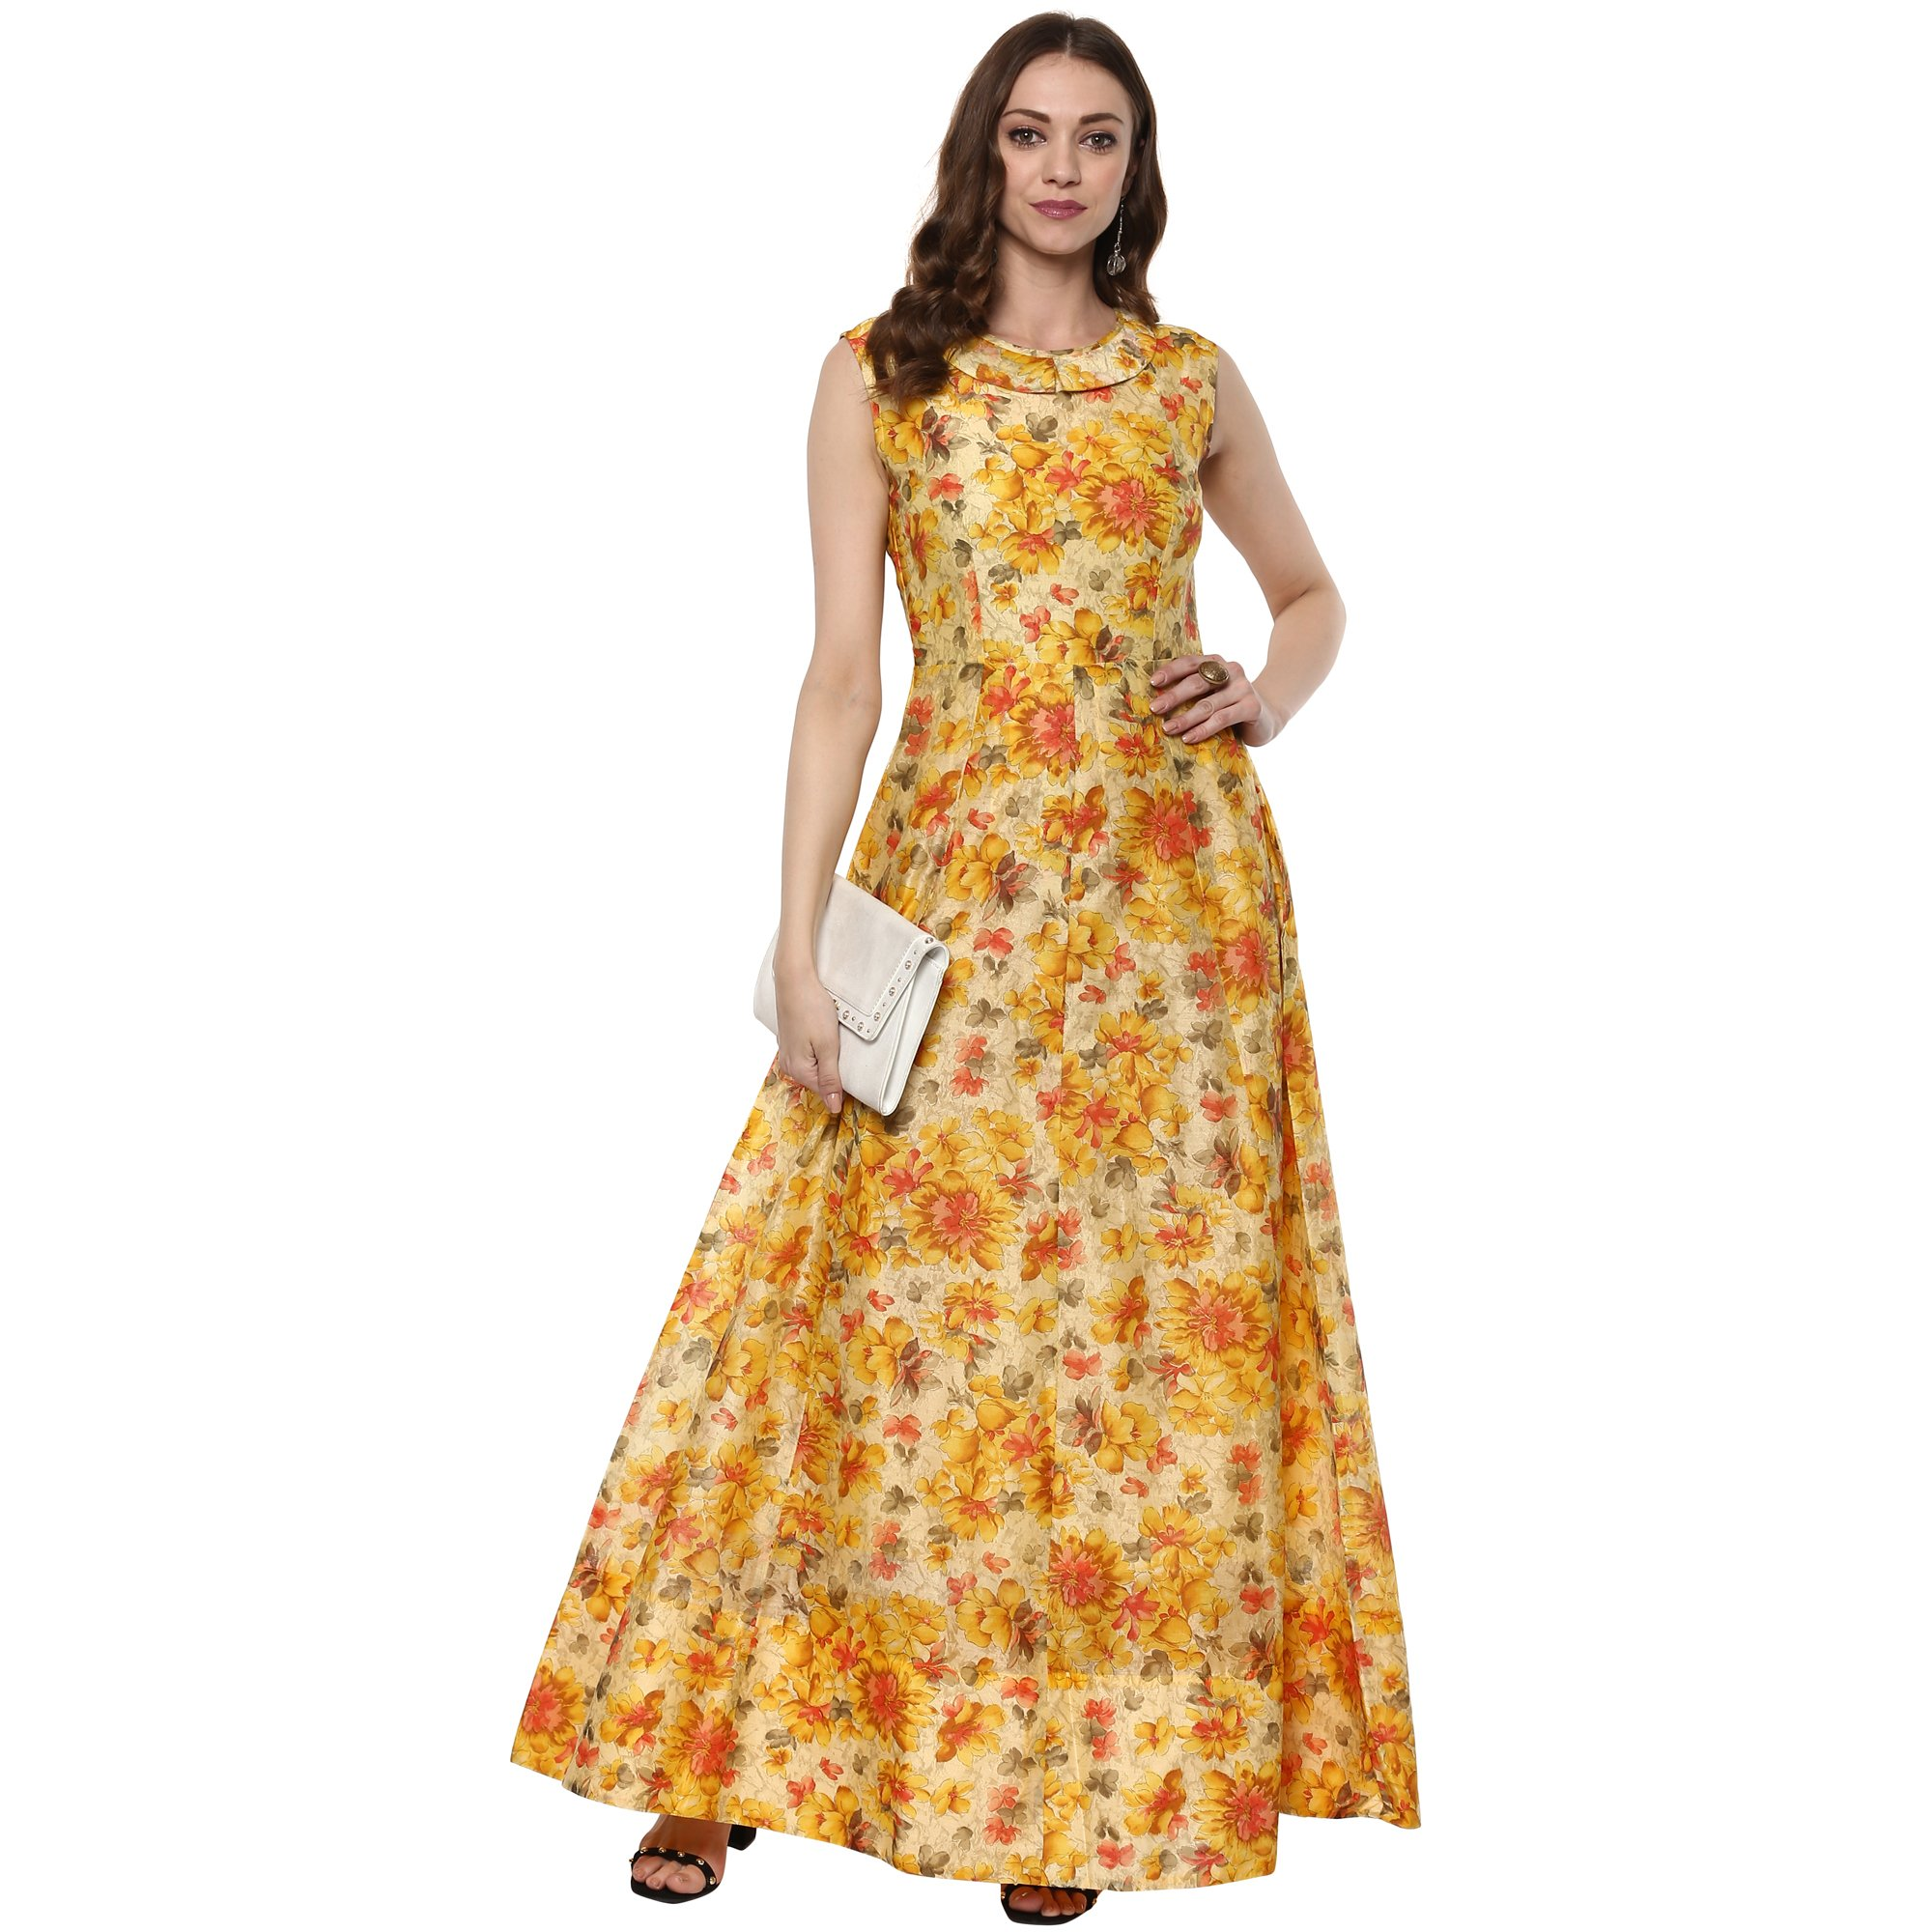 6aea17f866 Galleon - Indian Virasat Kurtis Ethnic Women Kurta Kurti Tunic  Multicolouredl Print Top Dress New Casual Wear